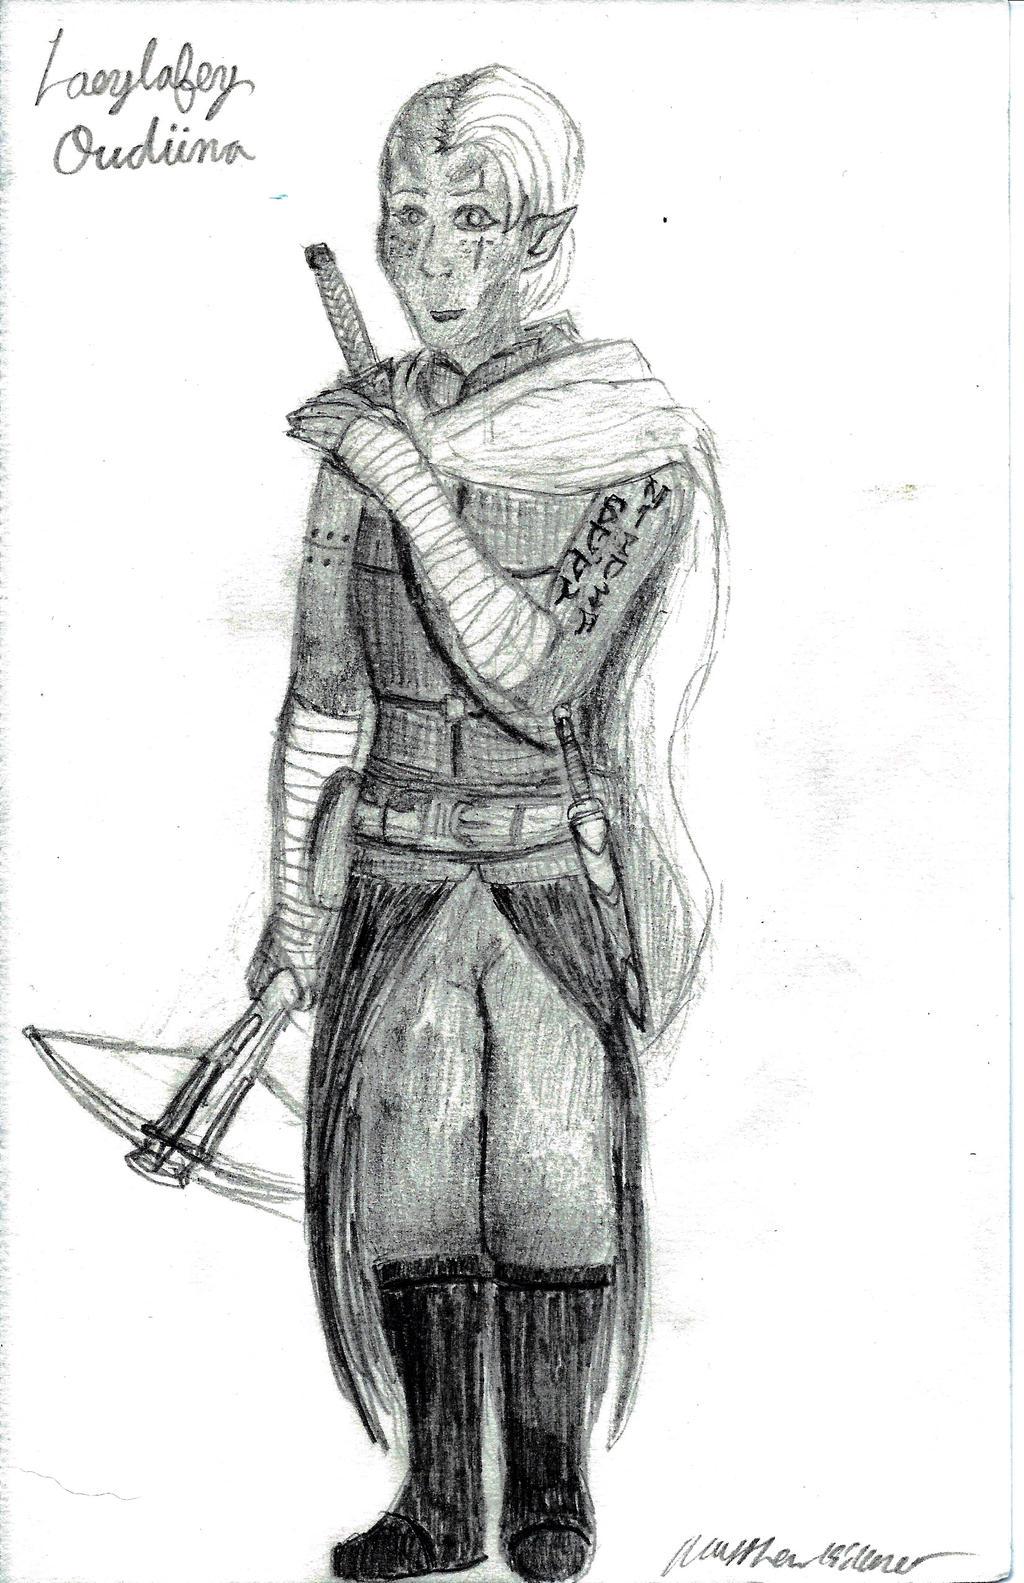 Laeylafey Oudiina by holmesian1891